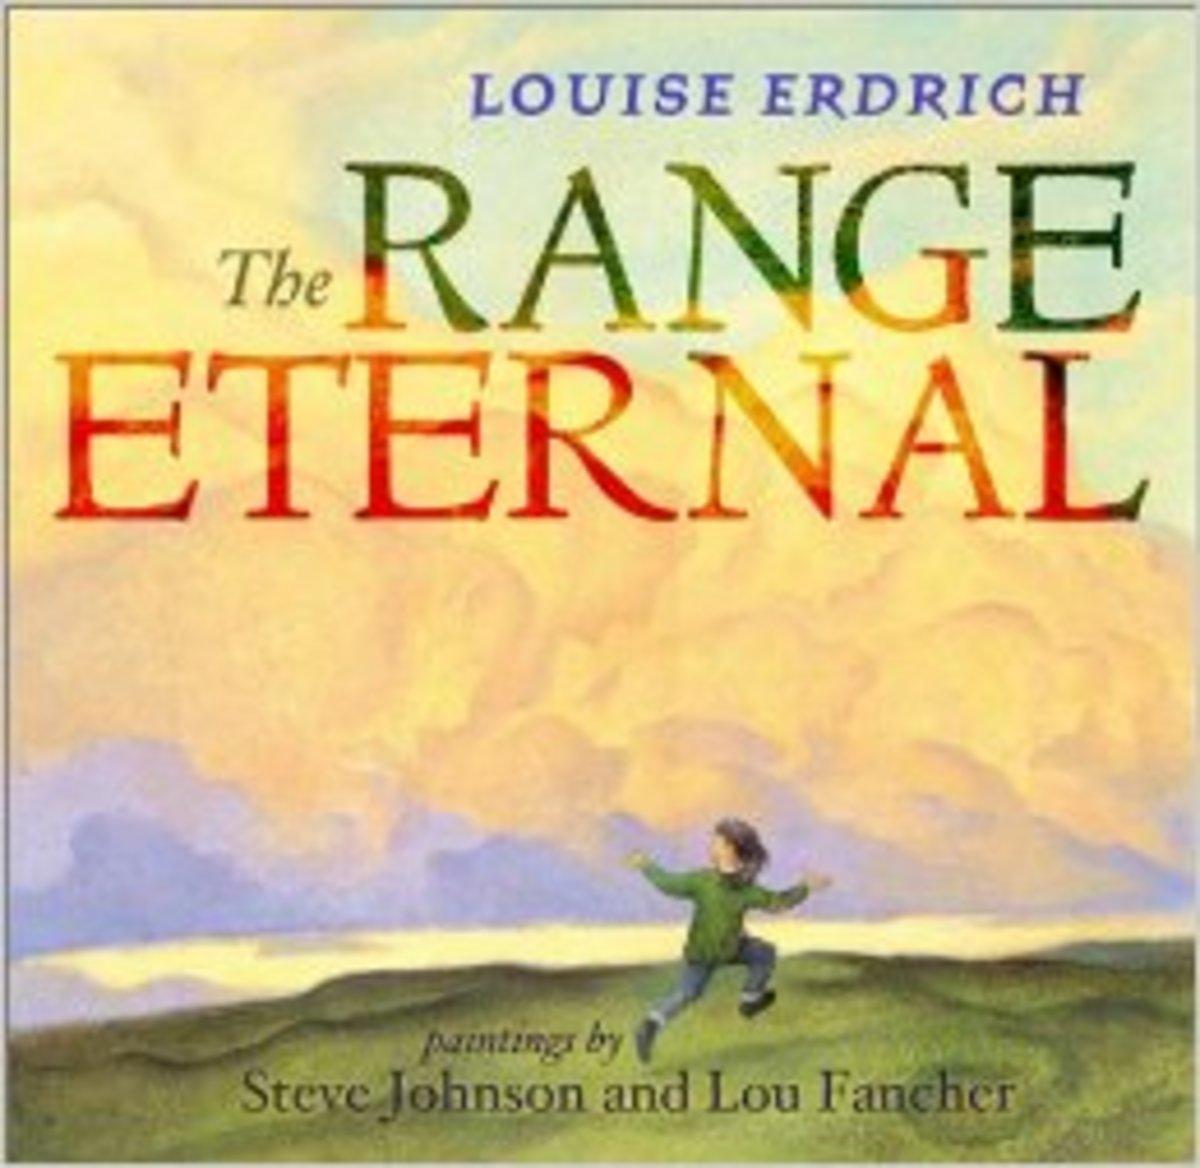 The Range Eternal by Louise Erdrich